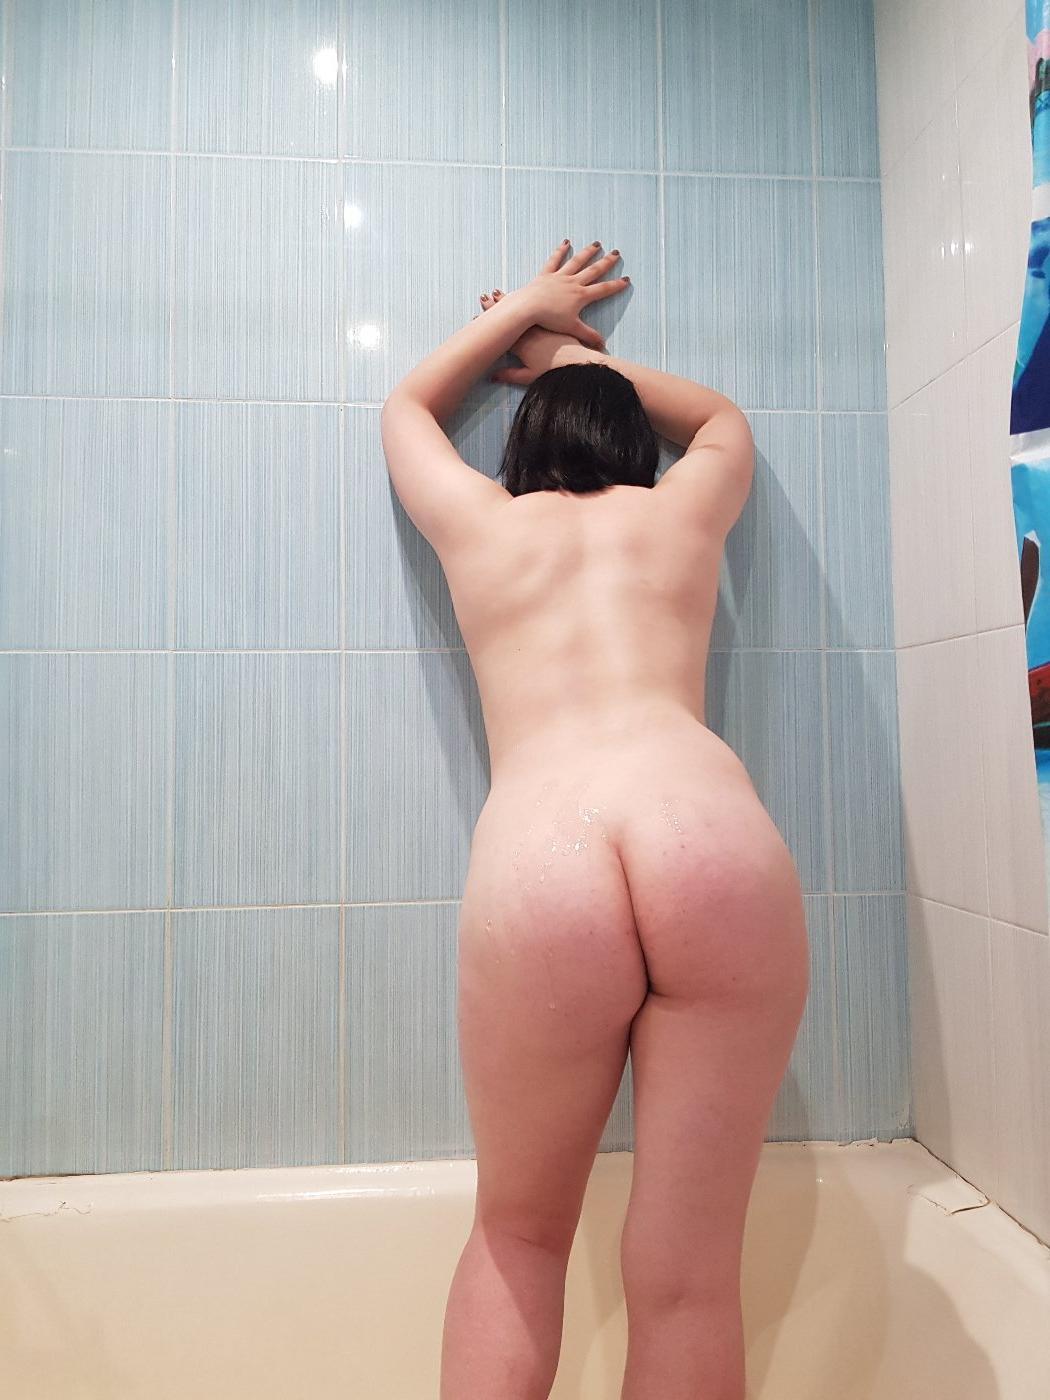 Индивидуалка Аля, 27 лет, метро Марксистская